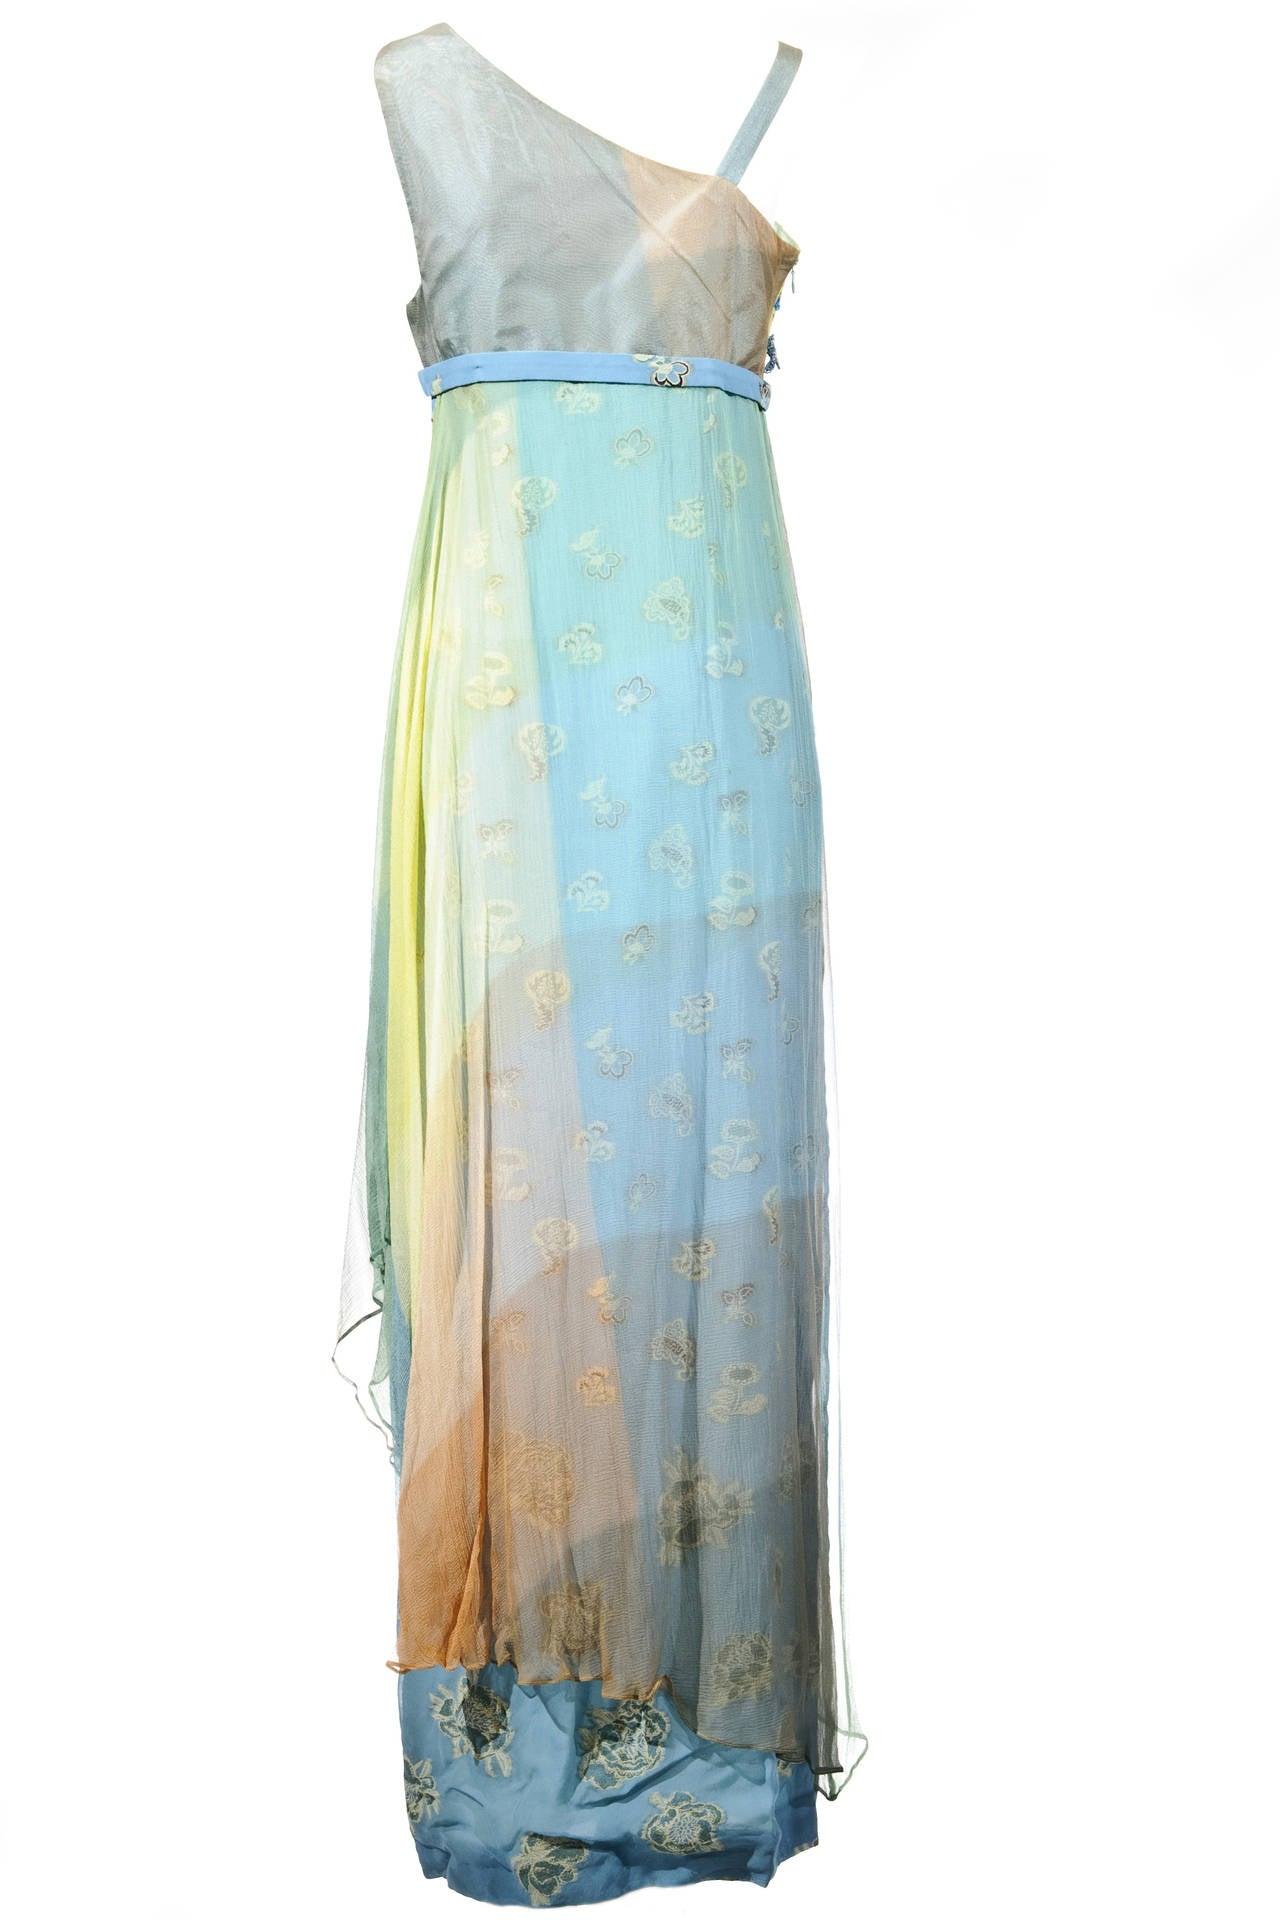 Gray Christian Lacroix 90'S Multi-color Floral Jacquard Printed Evening Dress For Sale